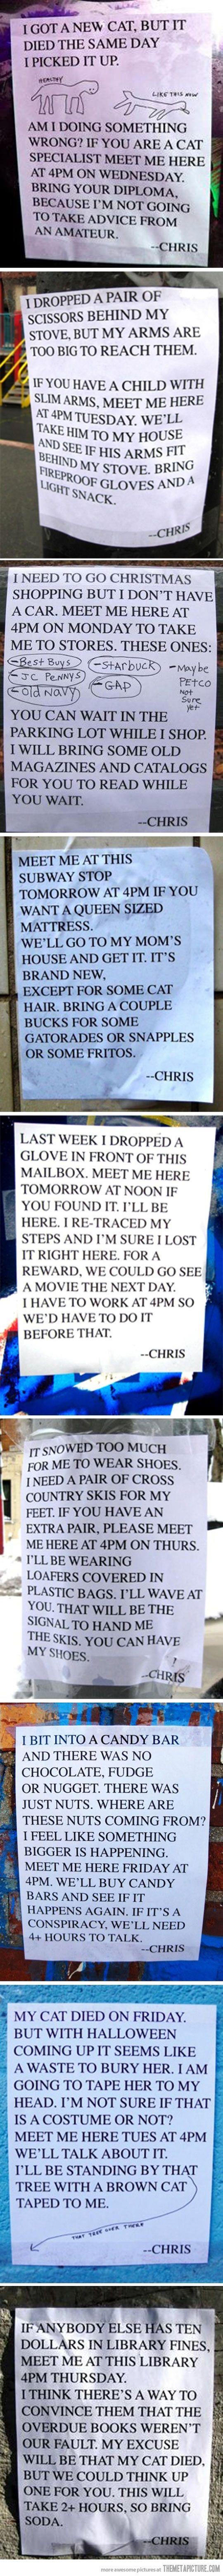 I M Pretty Sure I D Like To Meet Chris Laugh